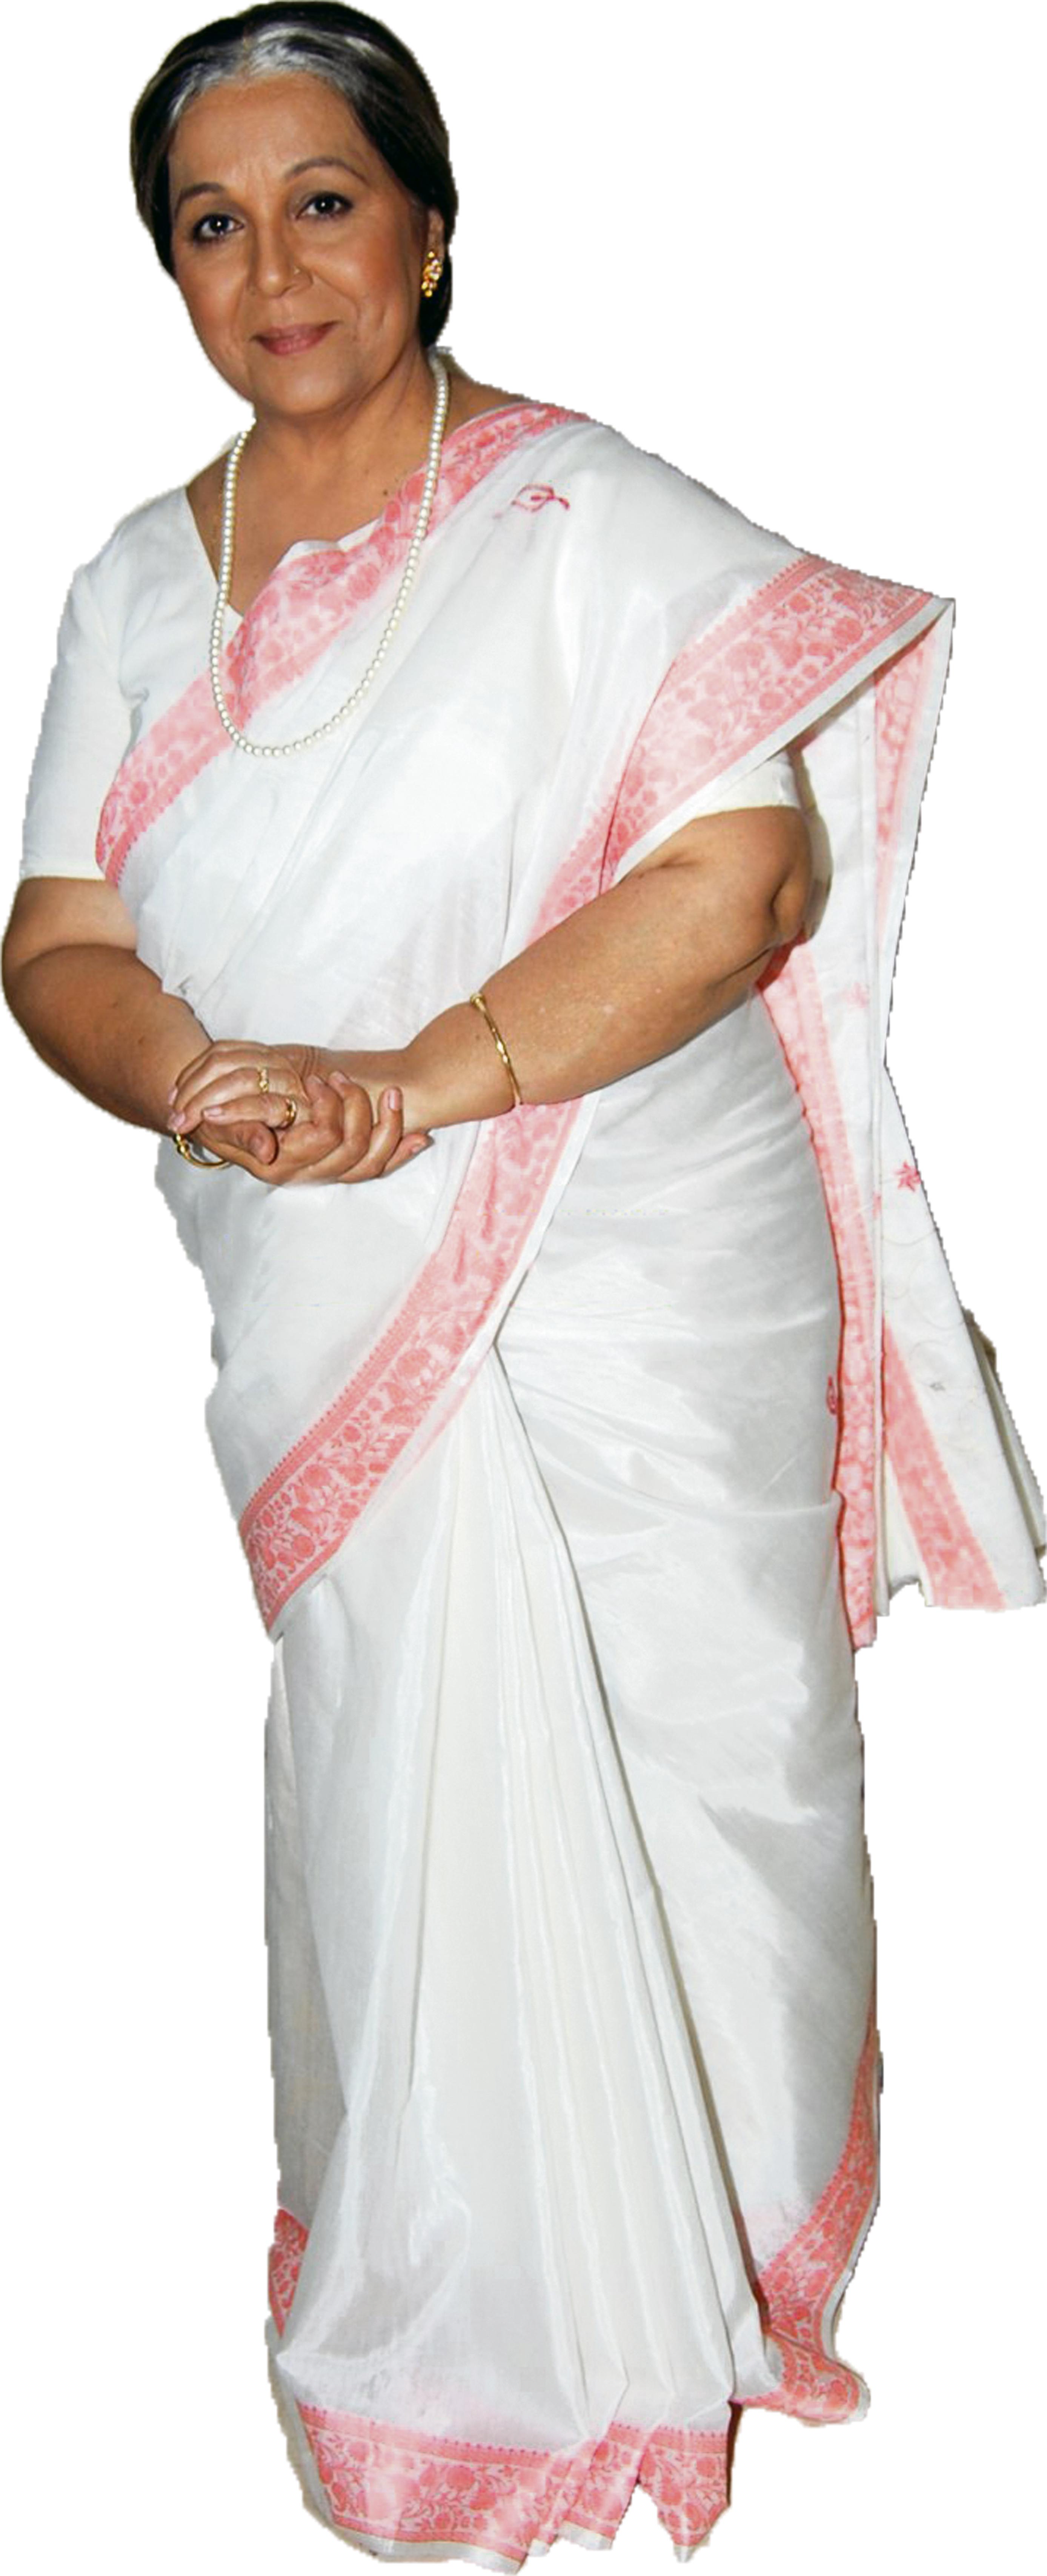 rohini hattangadi chaalbaaz